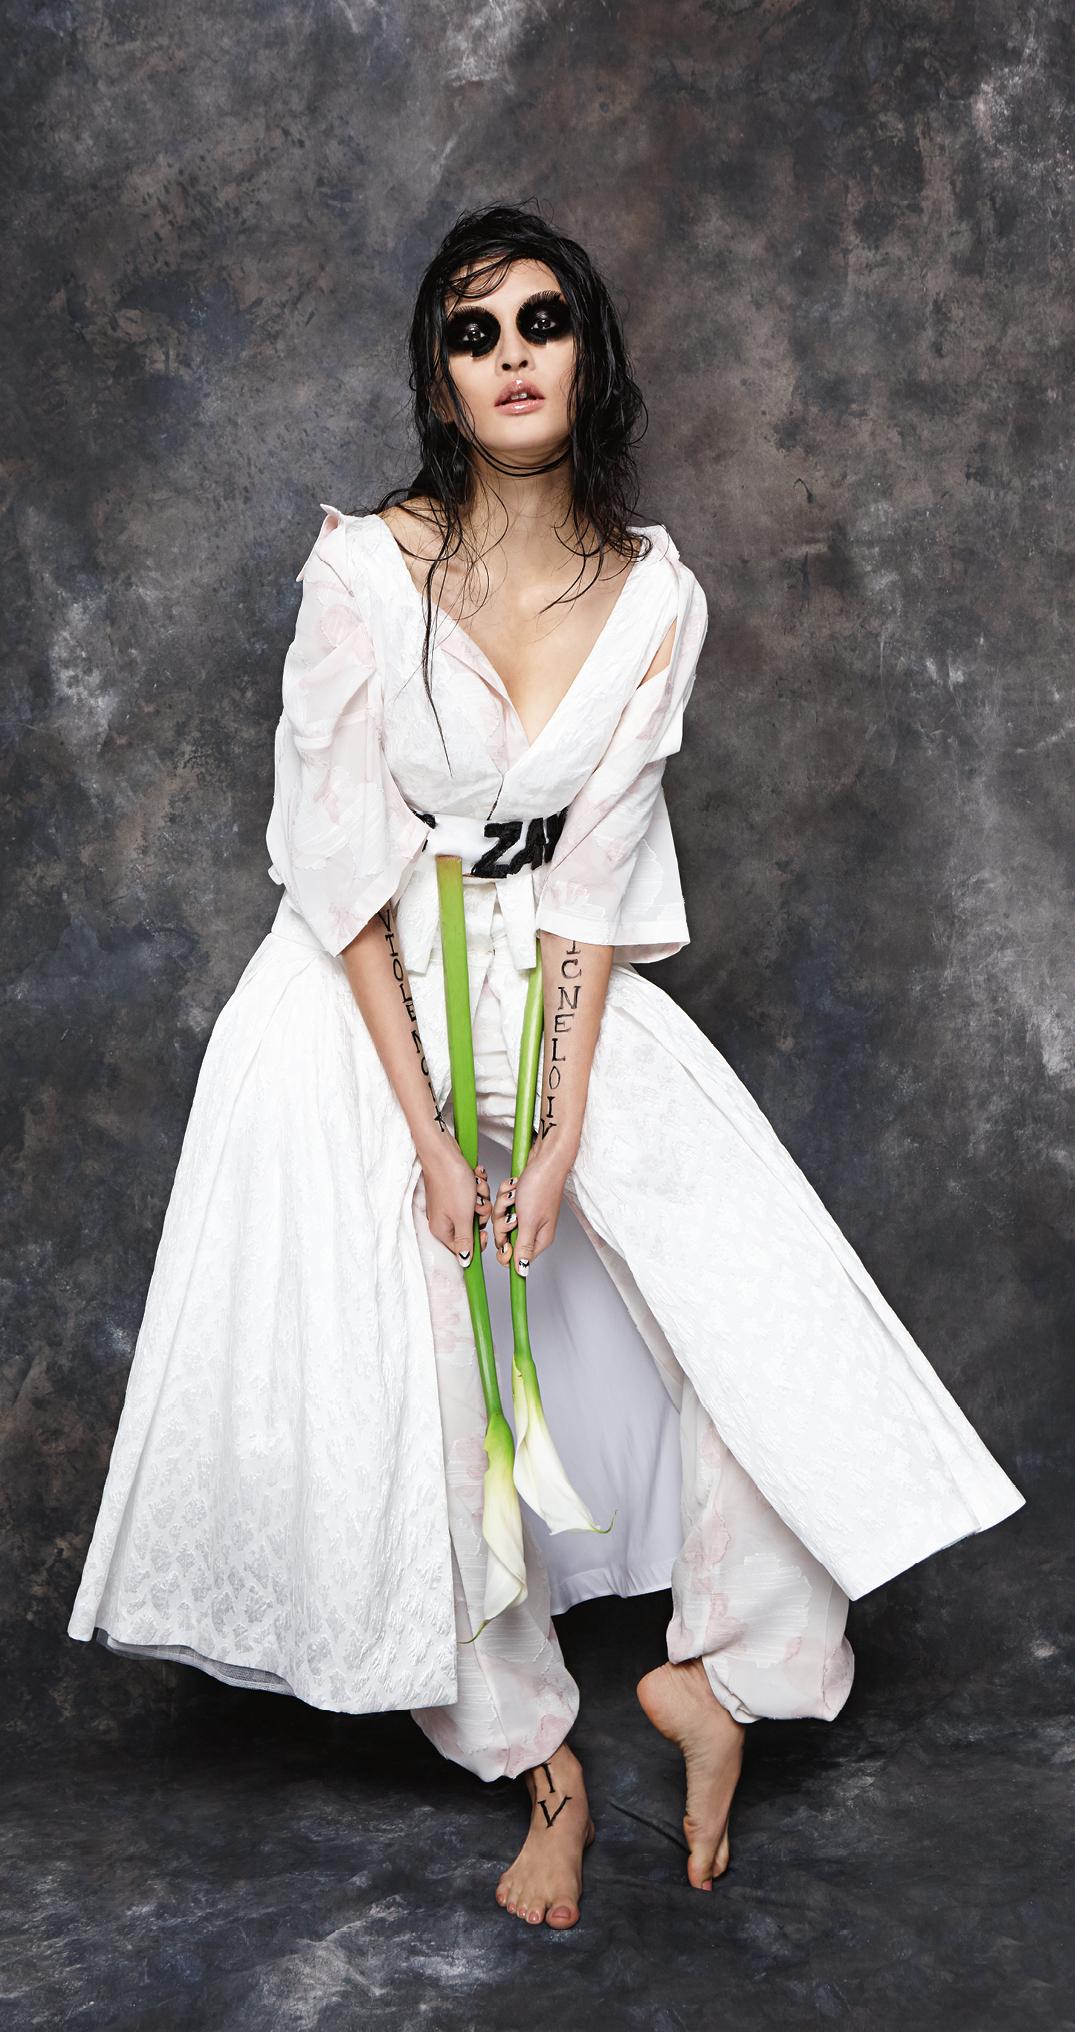 White peplum crop top and full skirt, both  Natasha Zinko.  Pink floral shirt and wide trousers, both  Zeynep Tosum.